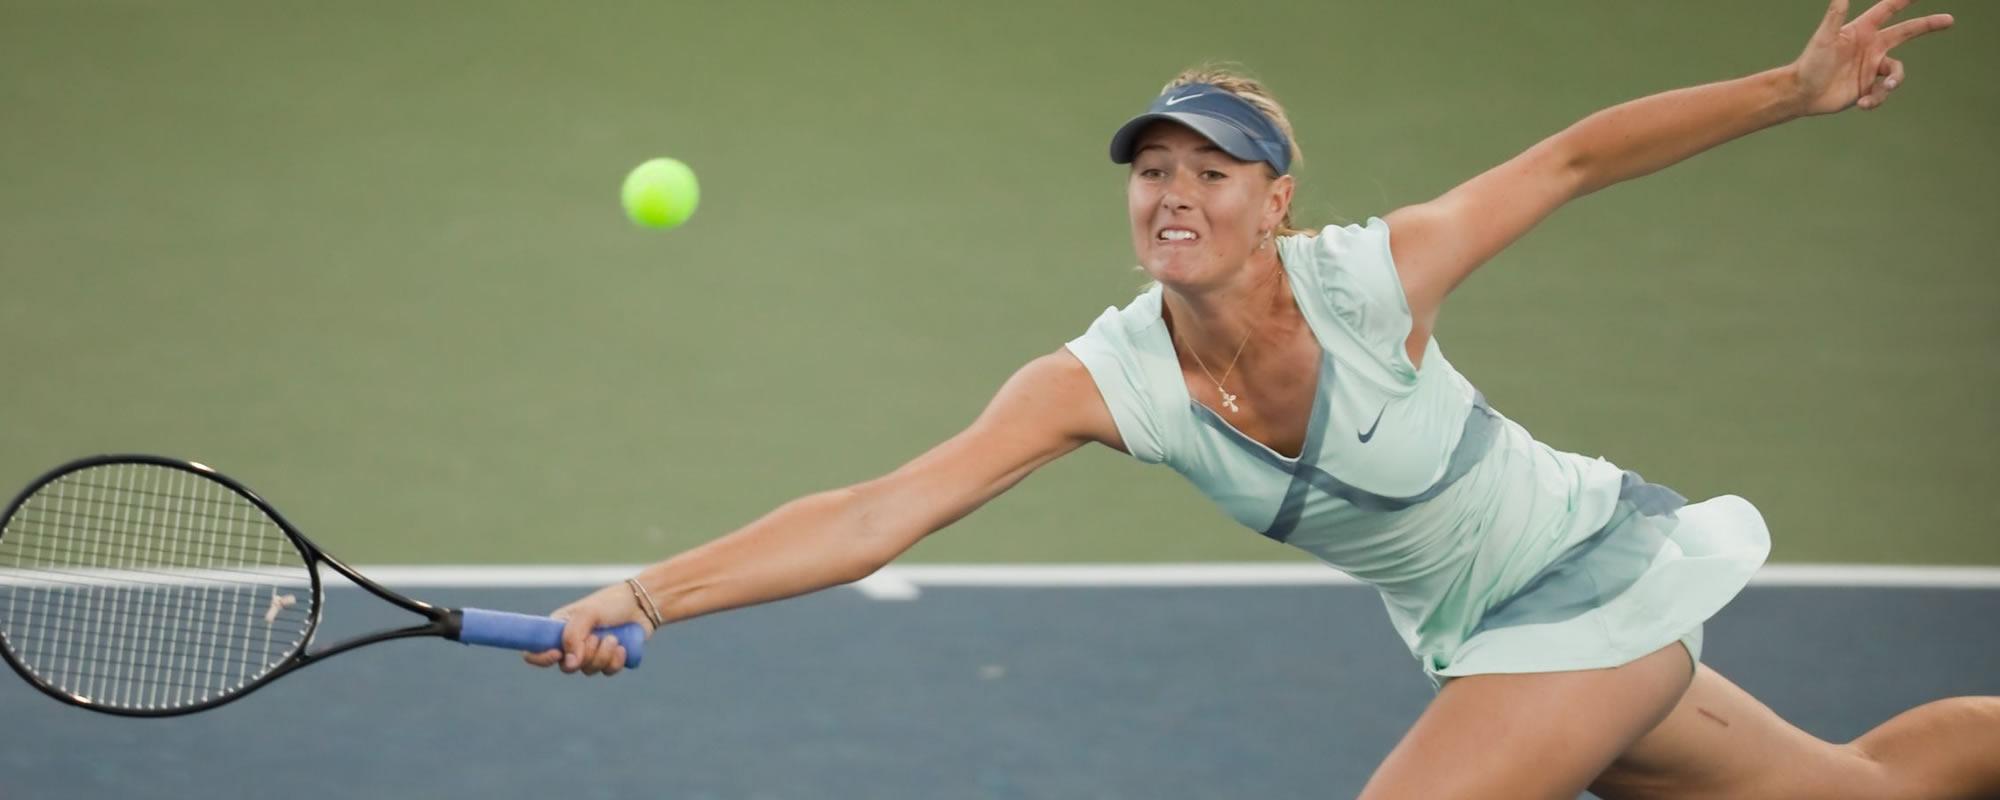 tennis goal setting